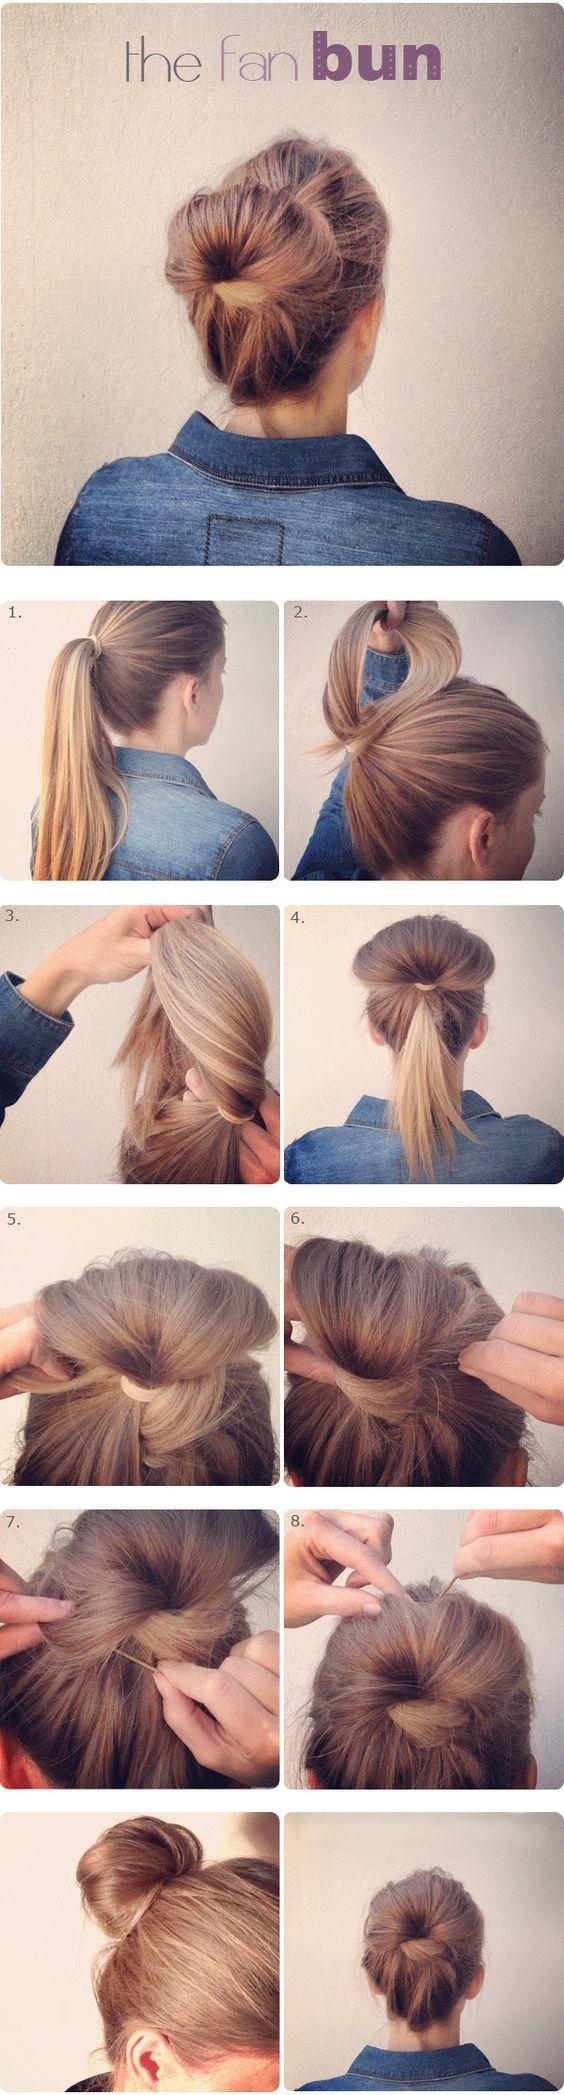 Hair How To The Fan Bun